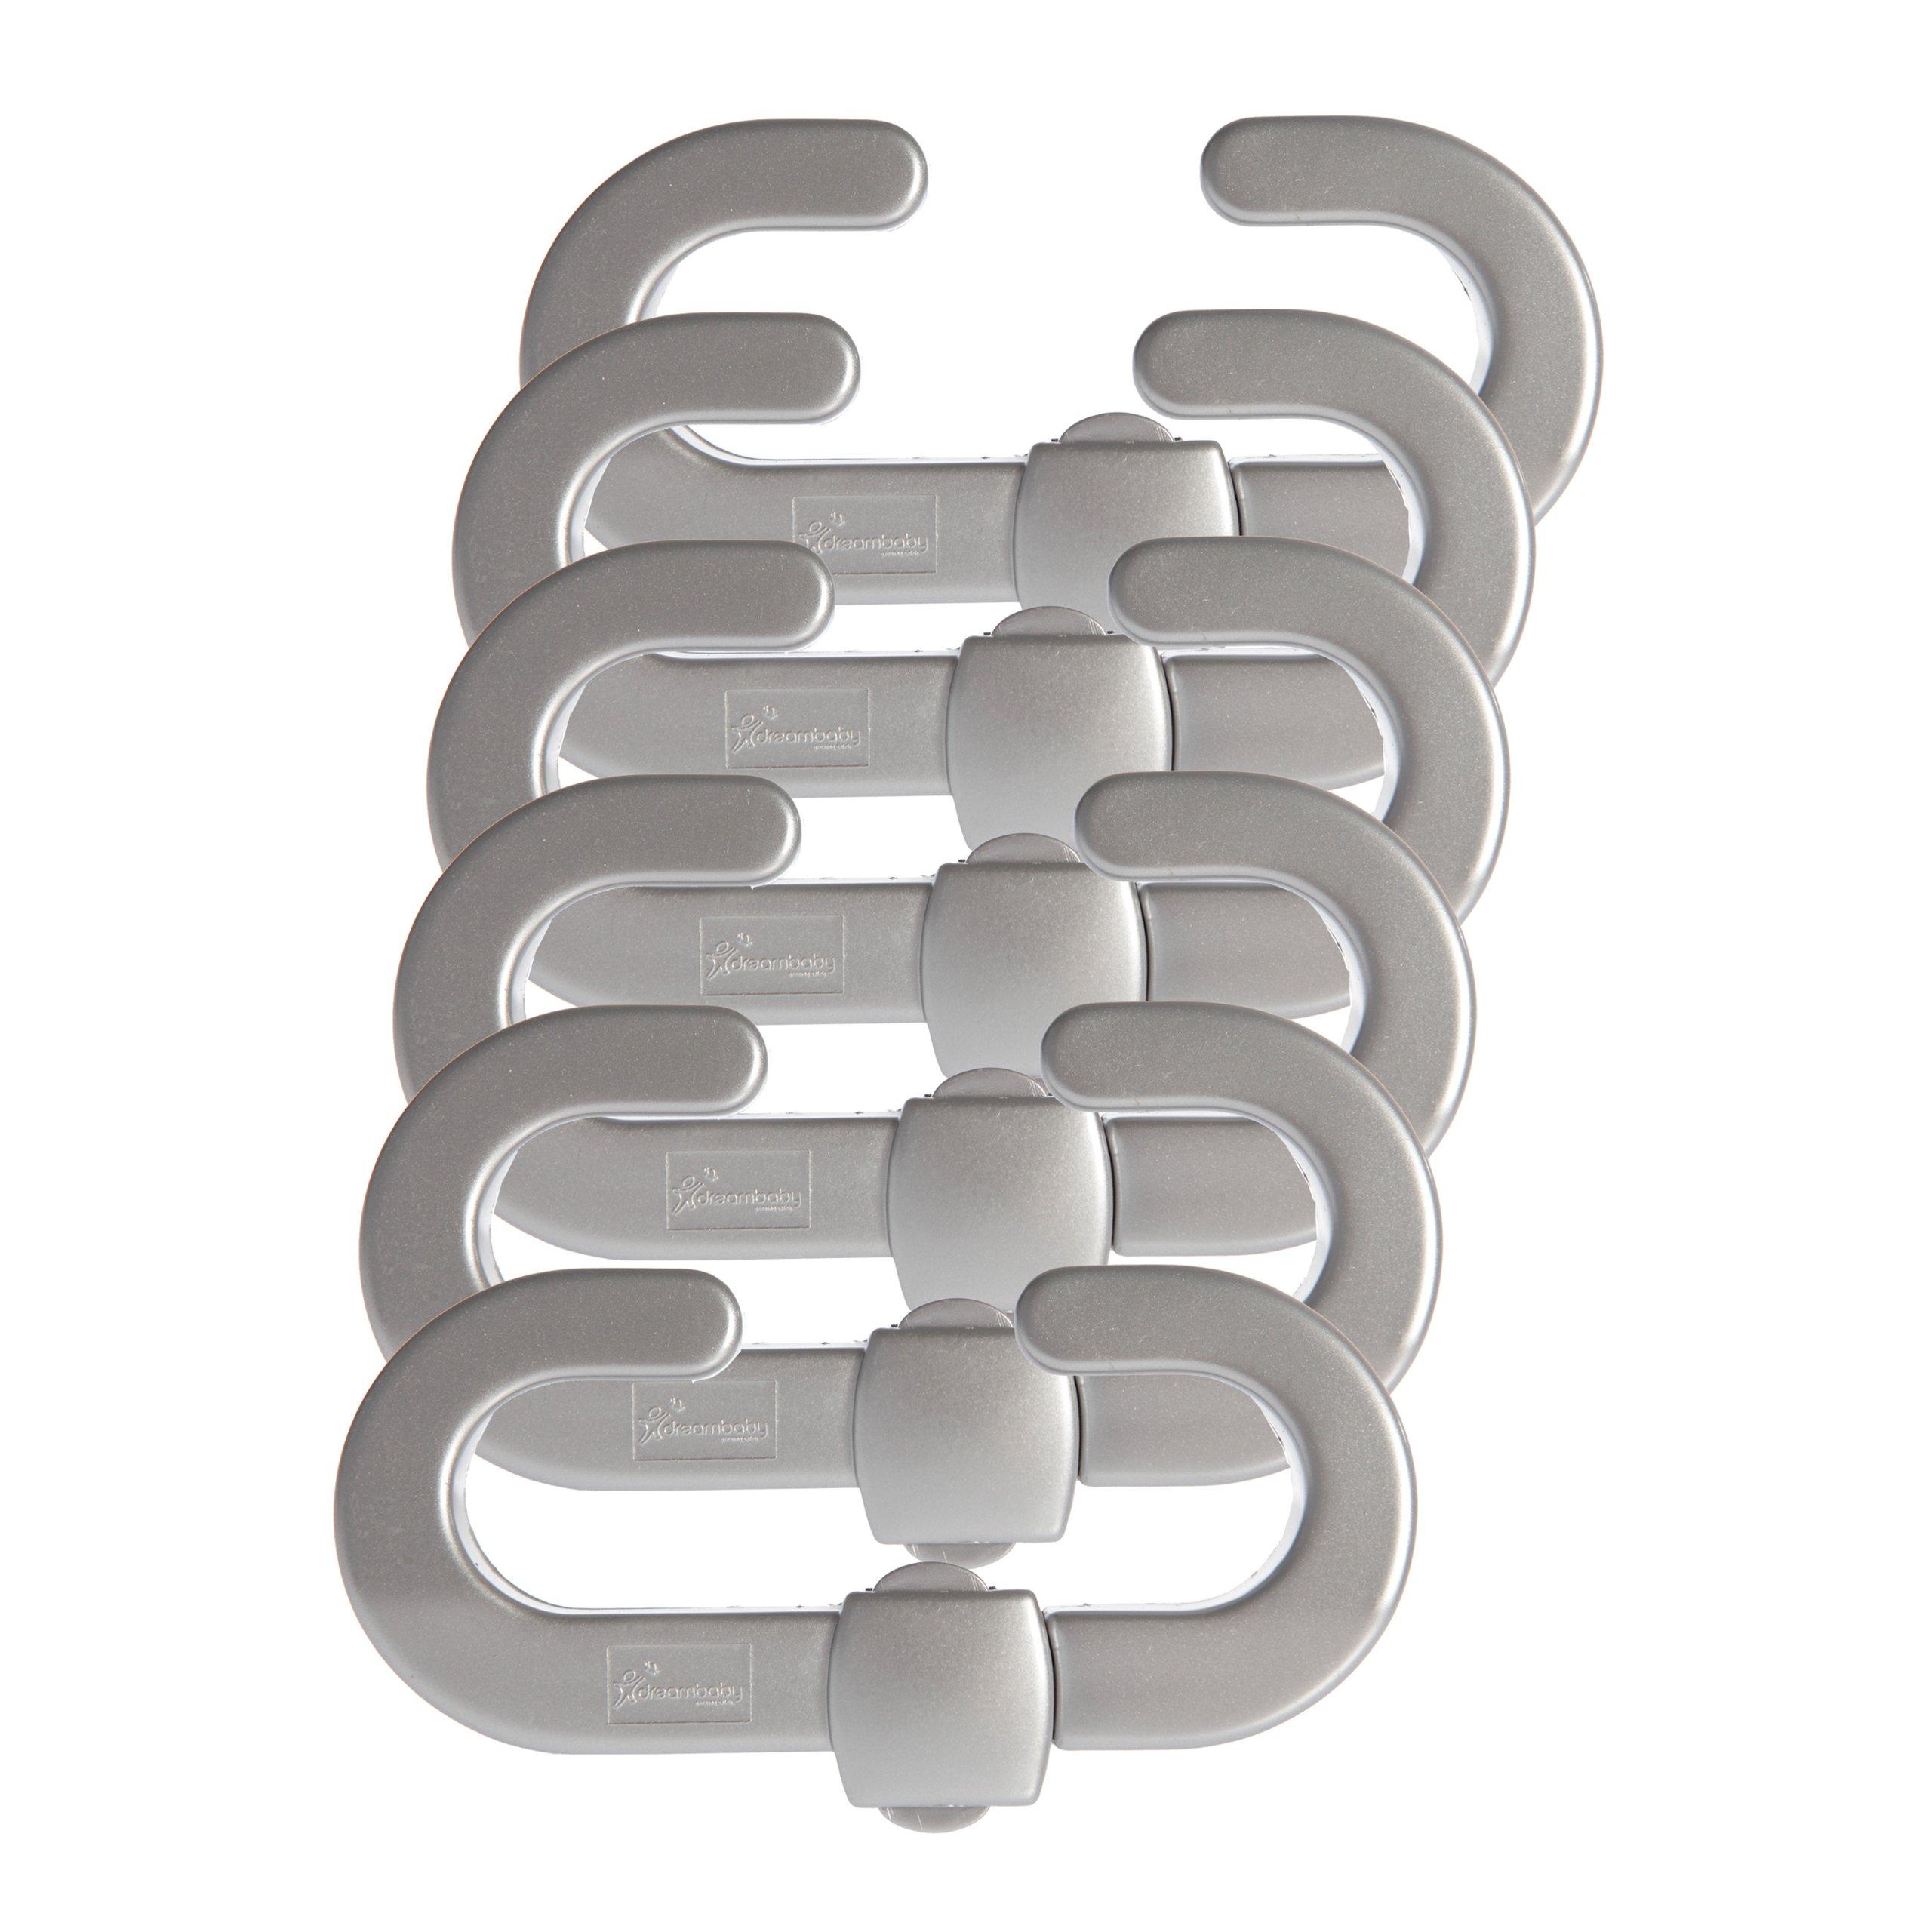 Dreambaby Silver Style Range Secure-A-Lock, Silver